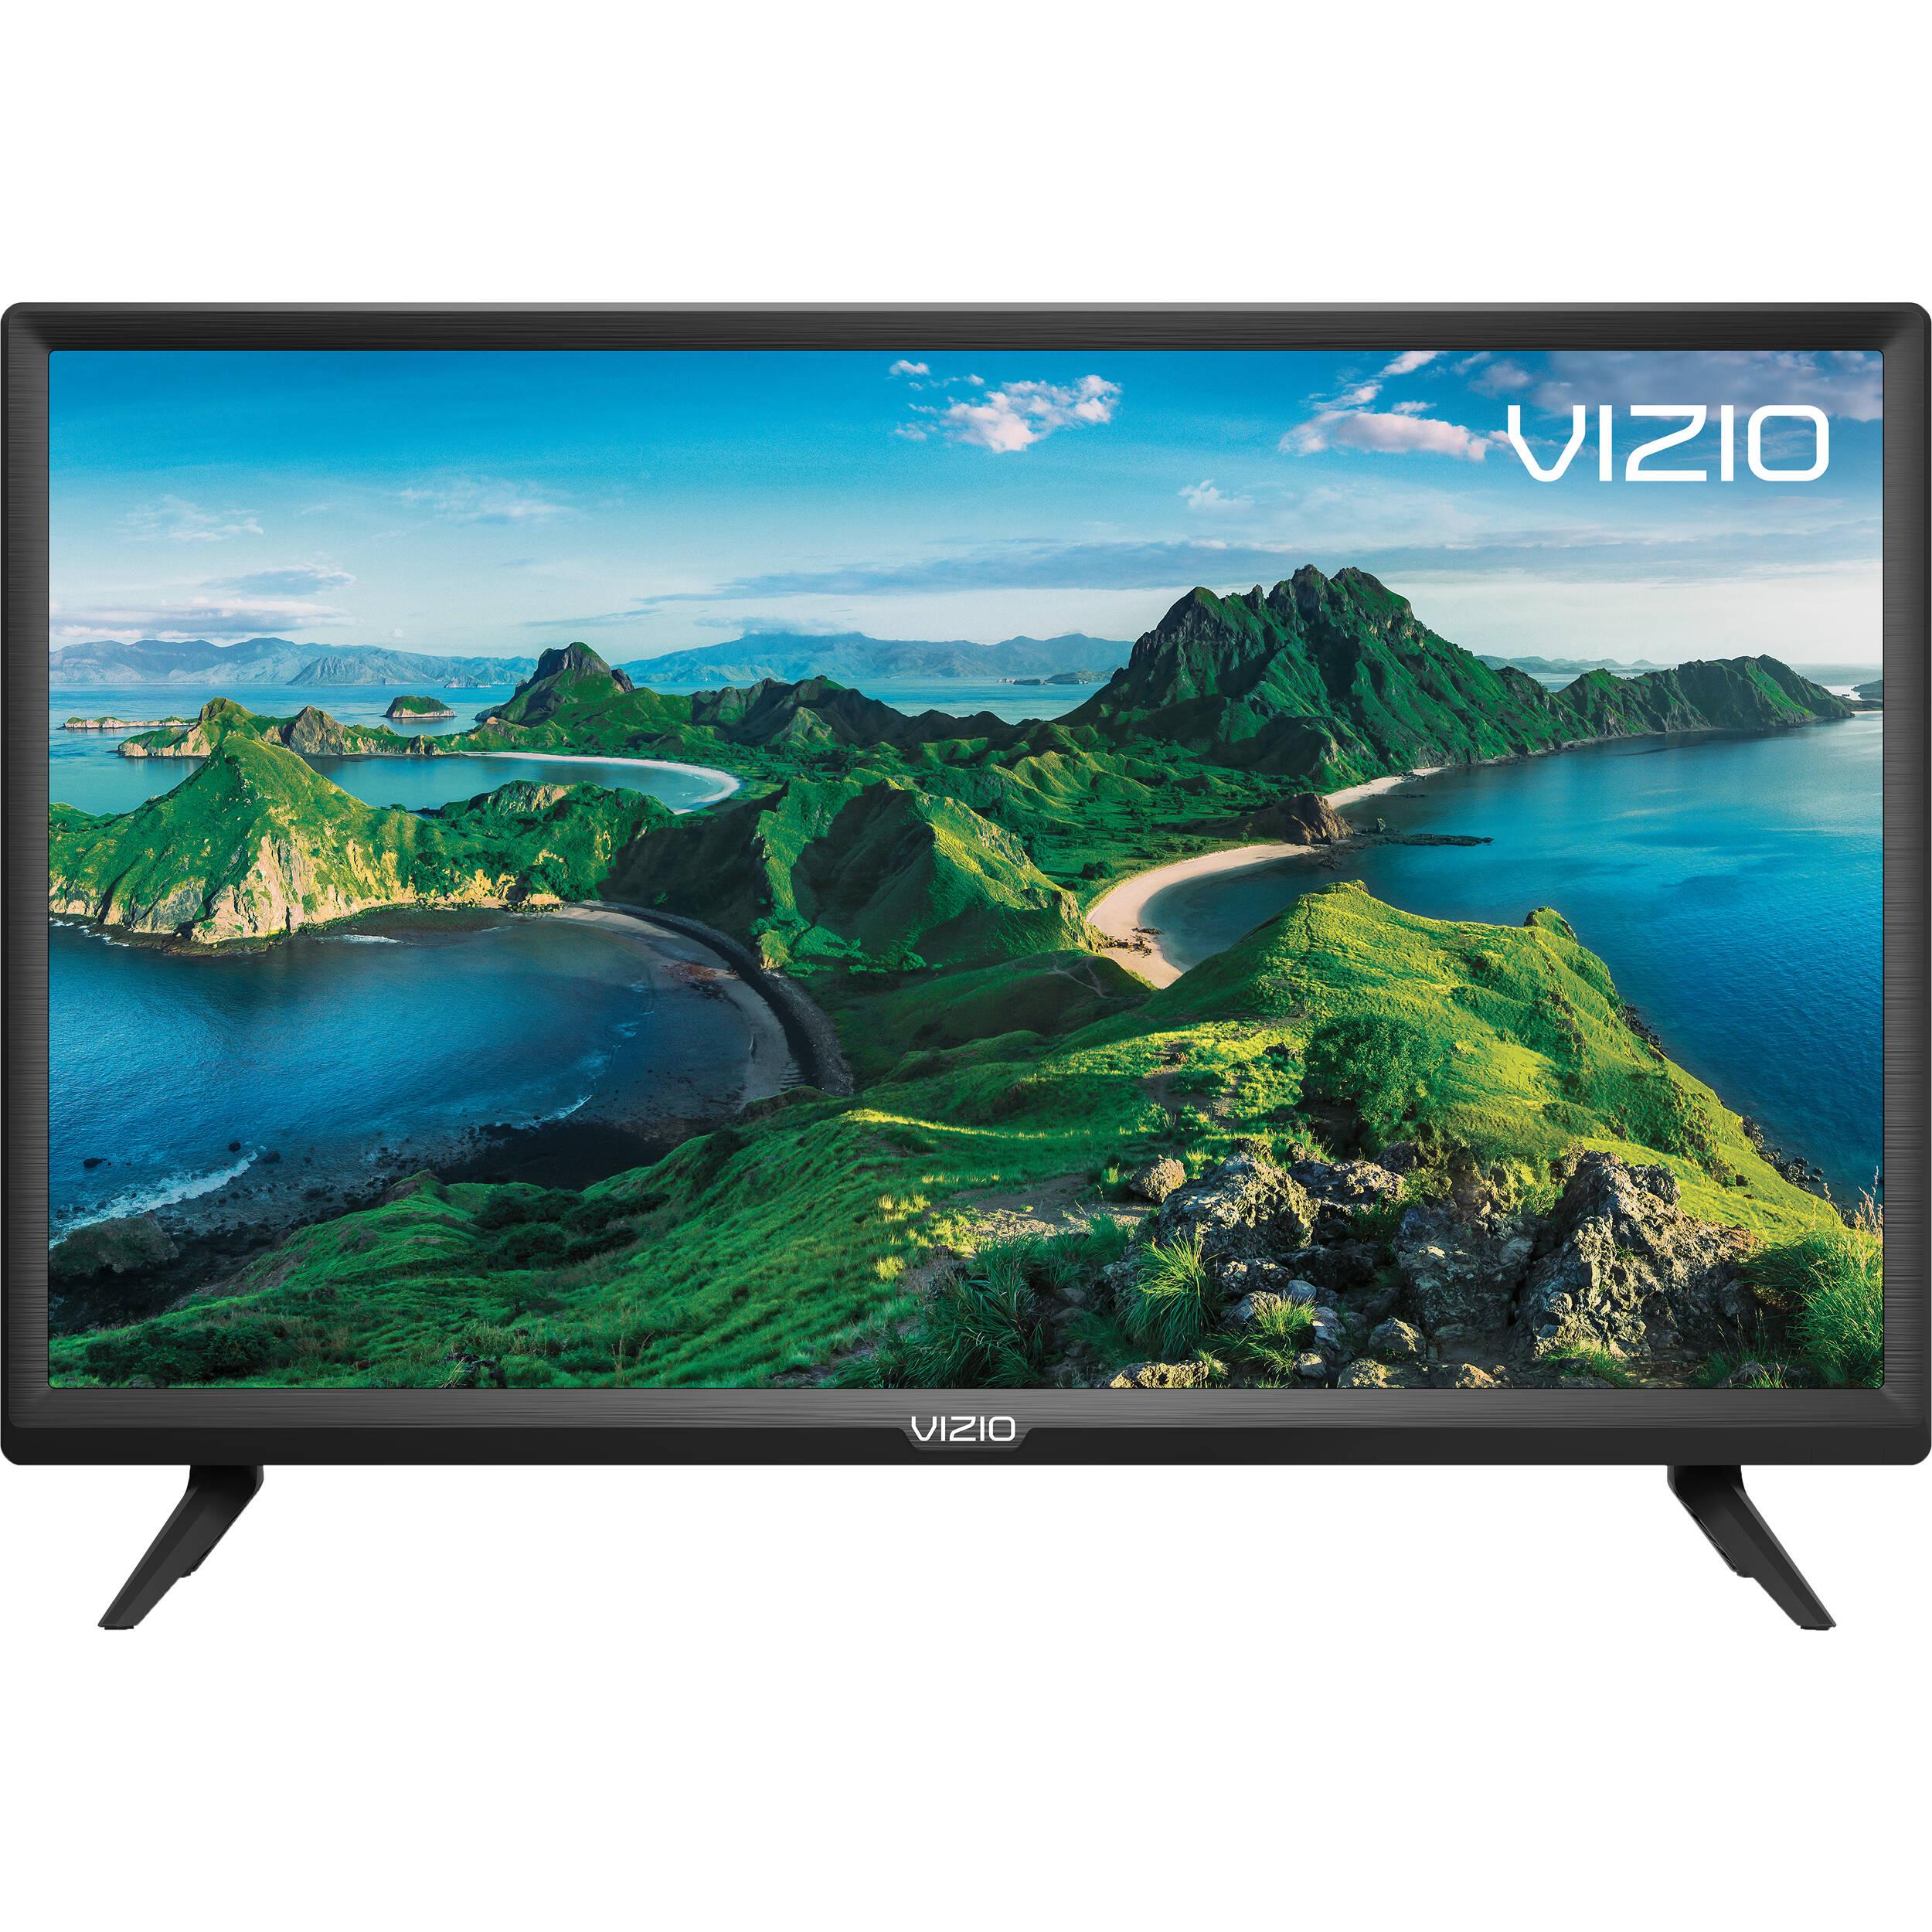 "Smart HDTV VIZIO LED D-Series 1080p 24/"" Class"